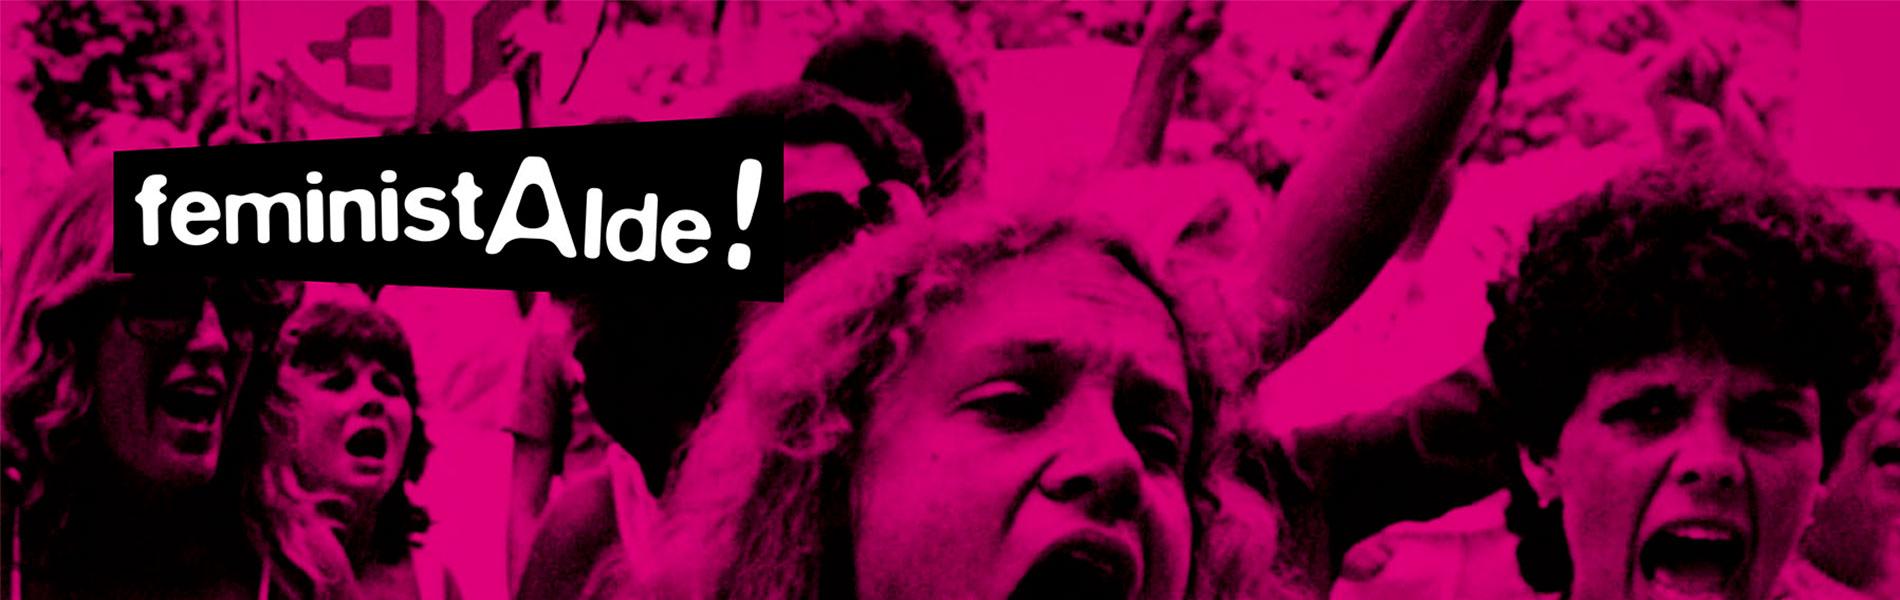 feministalde-portada-1900x600